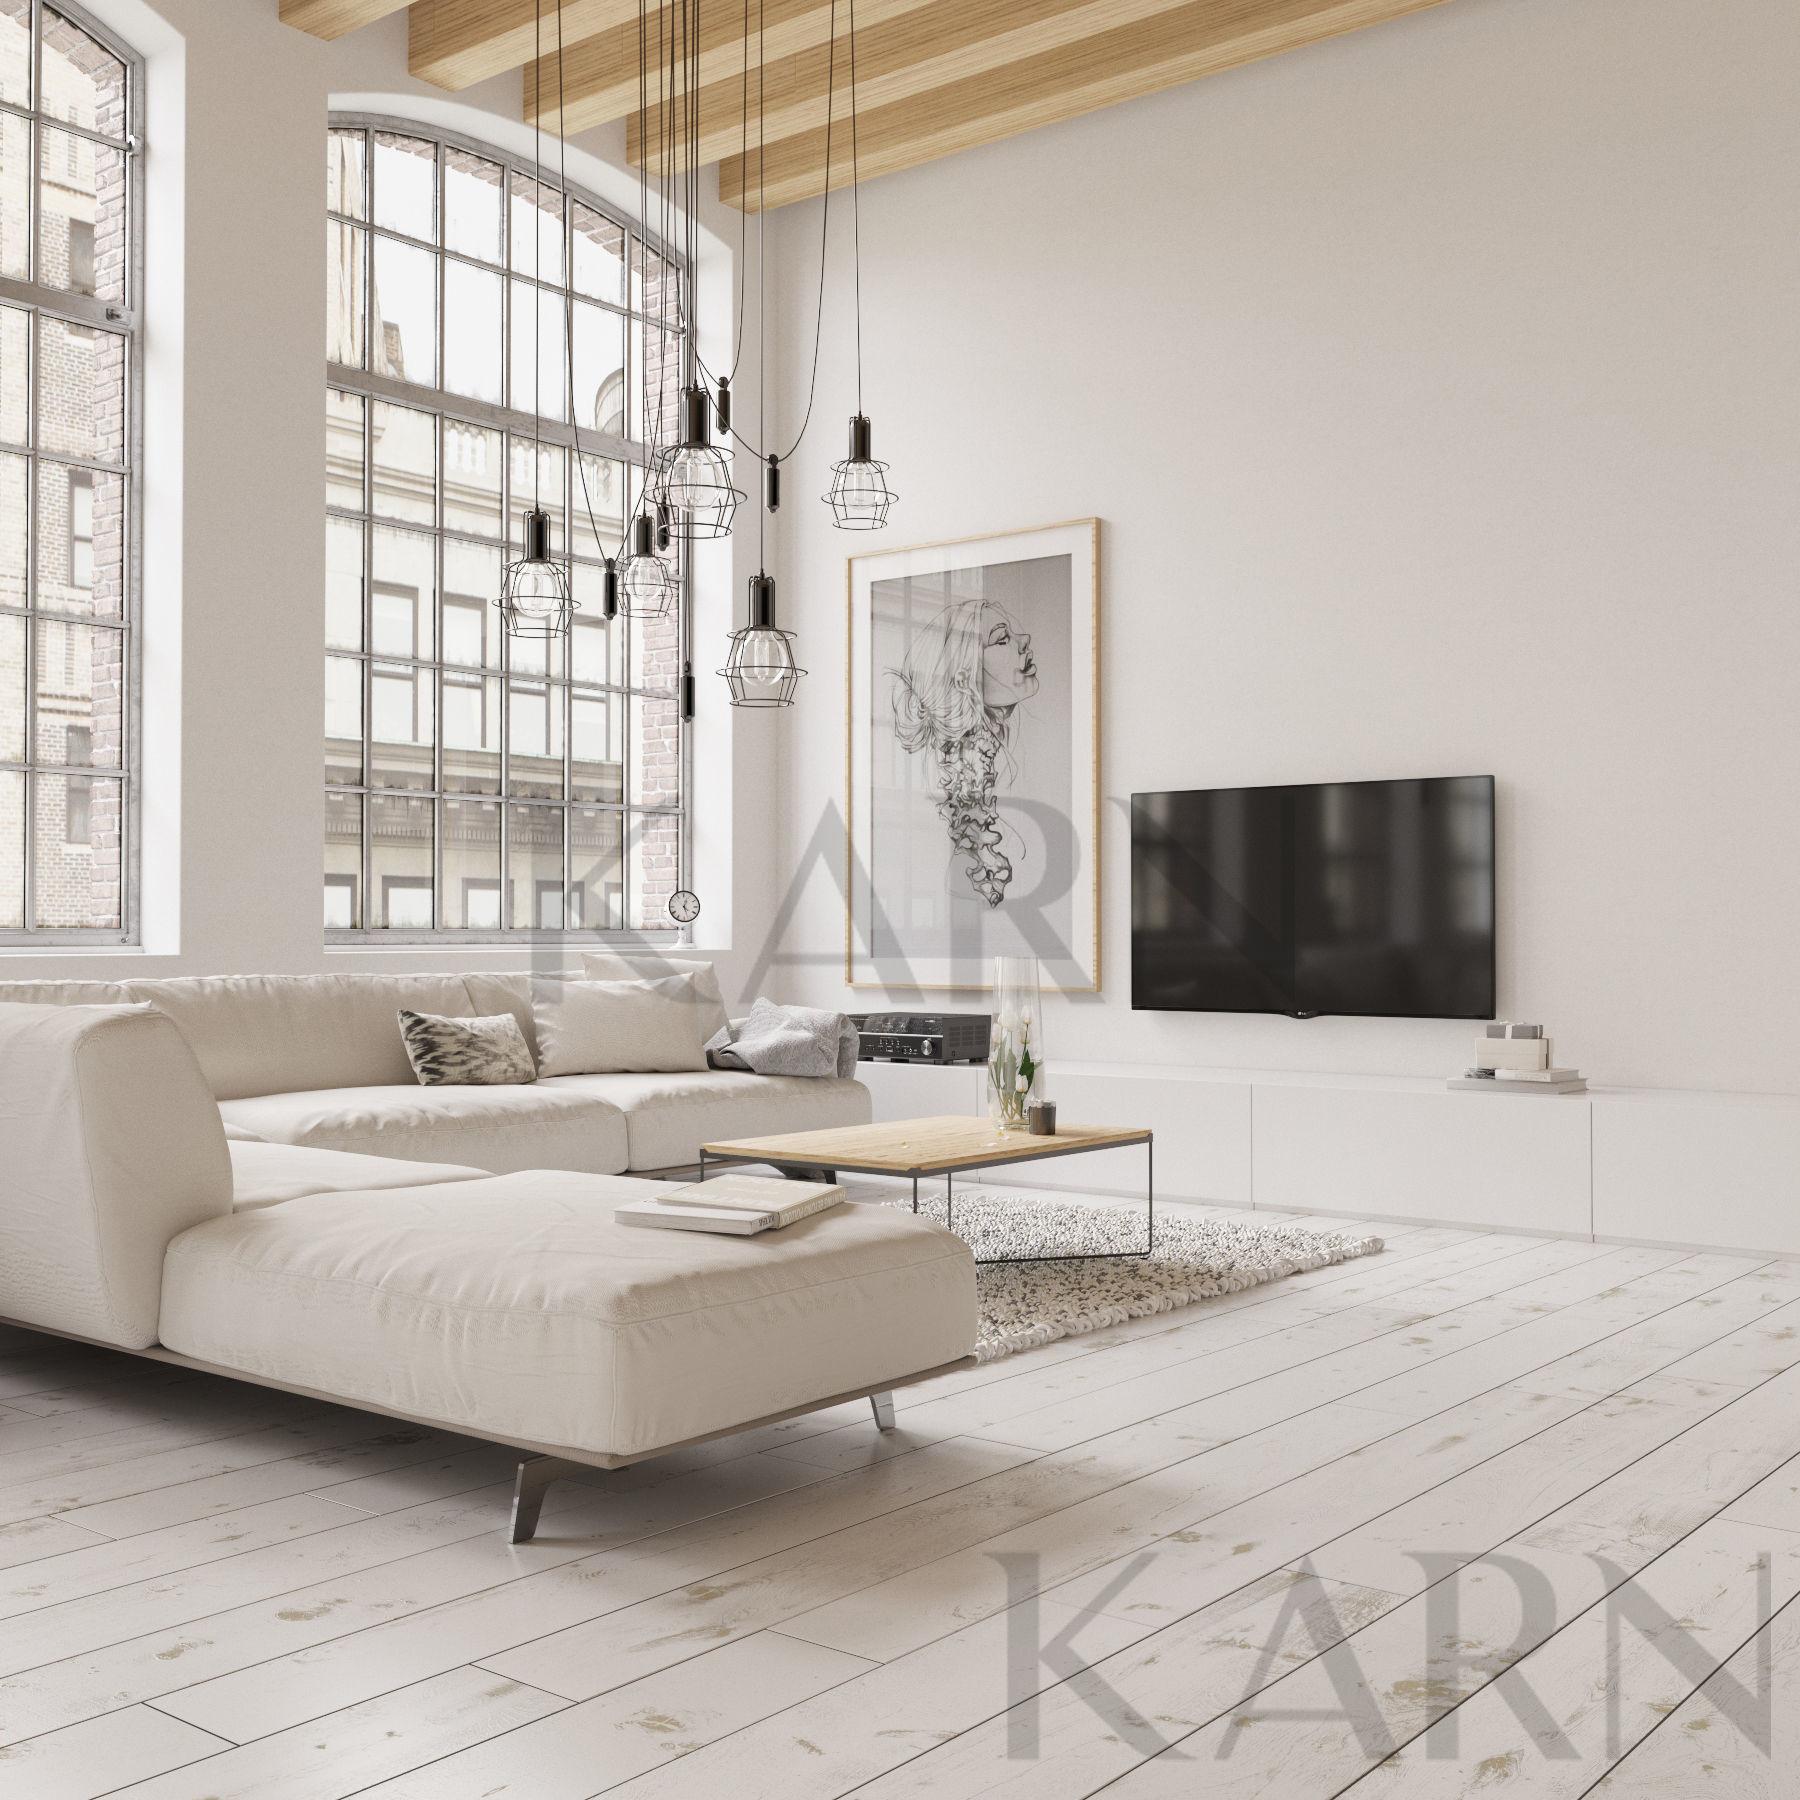 3d Luxury Living Room On A Residense Modern Style